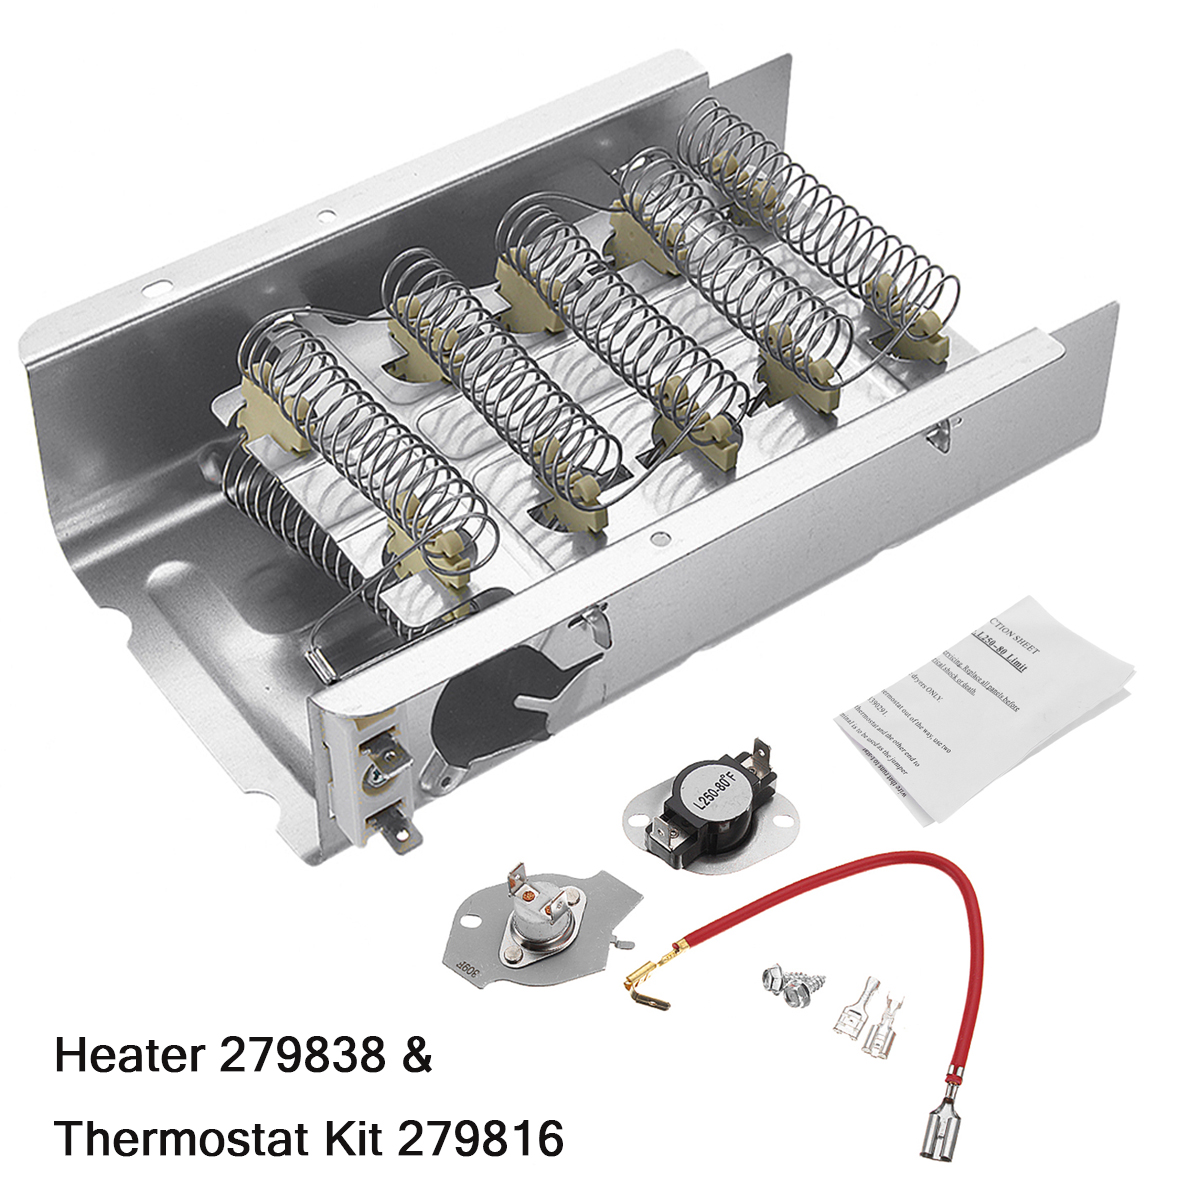 240V 5400W Dryer Heating Element & Thermostat Kit 3403585 For Whirlpool  Mayta Roper